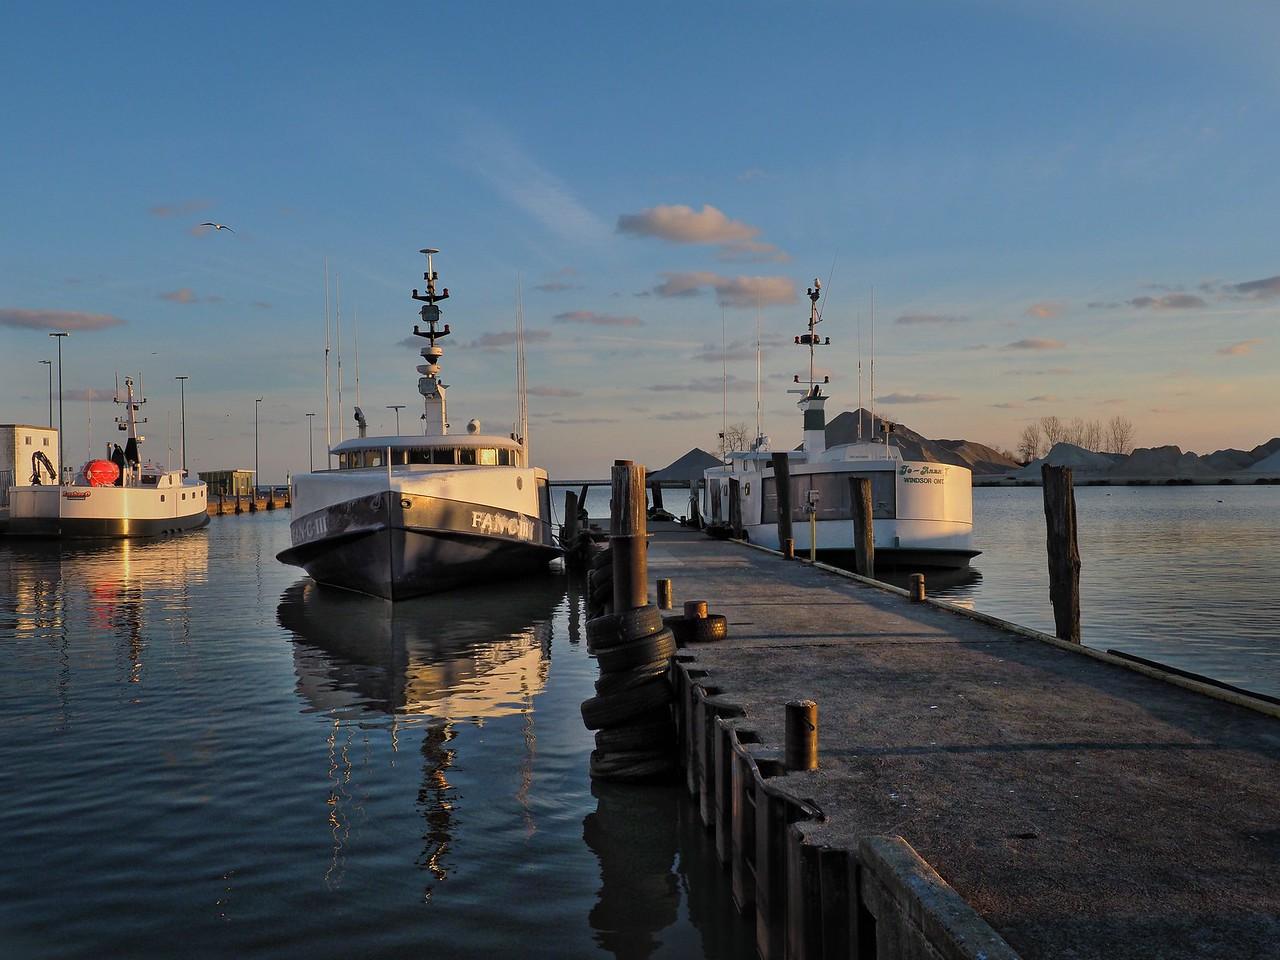 Kingsville docks